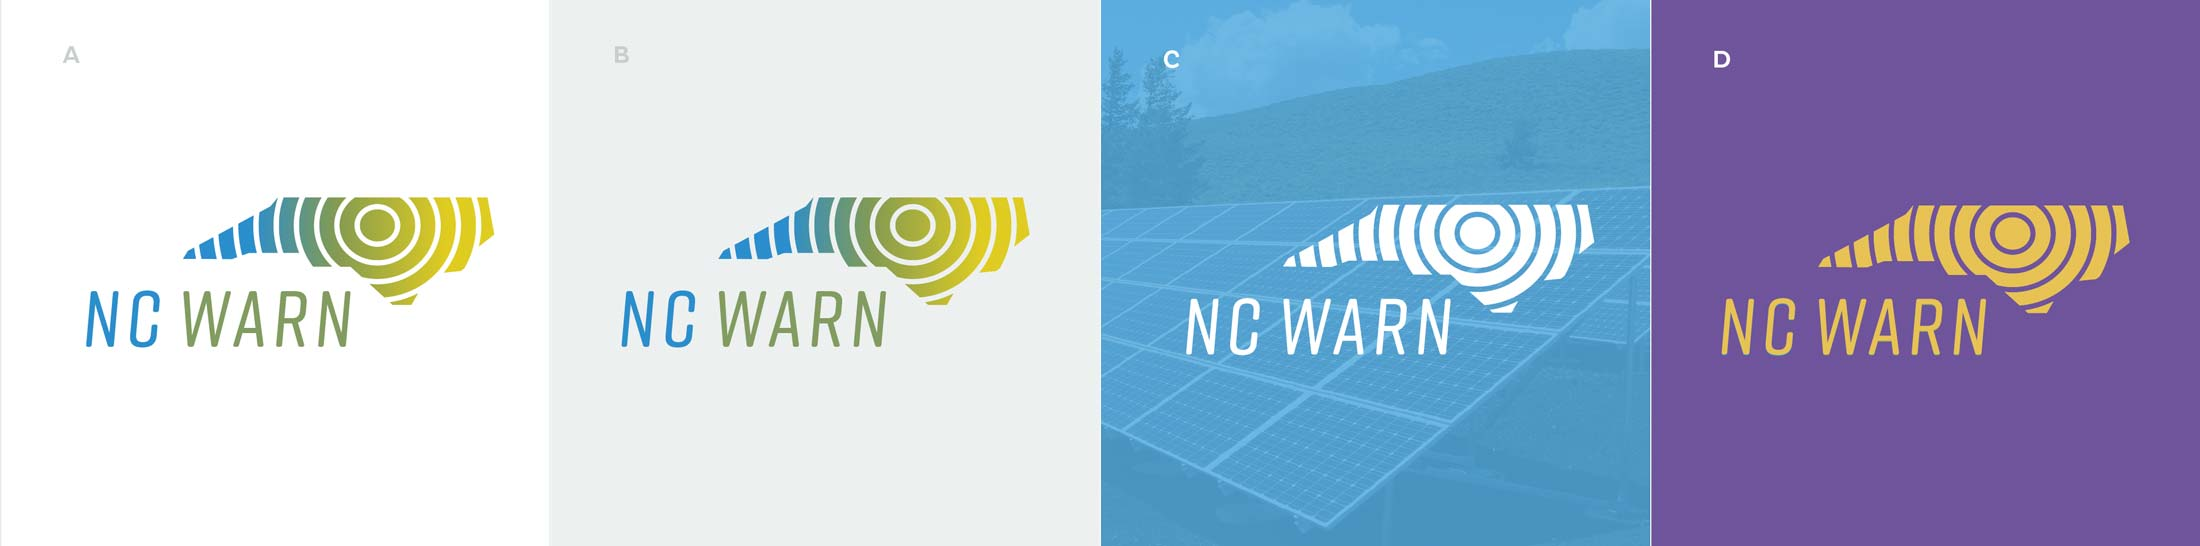 NC WARN logo colors